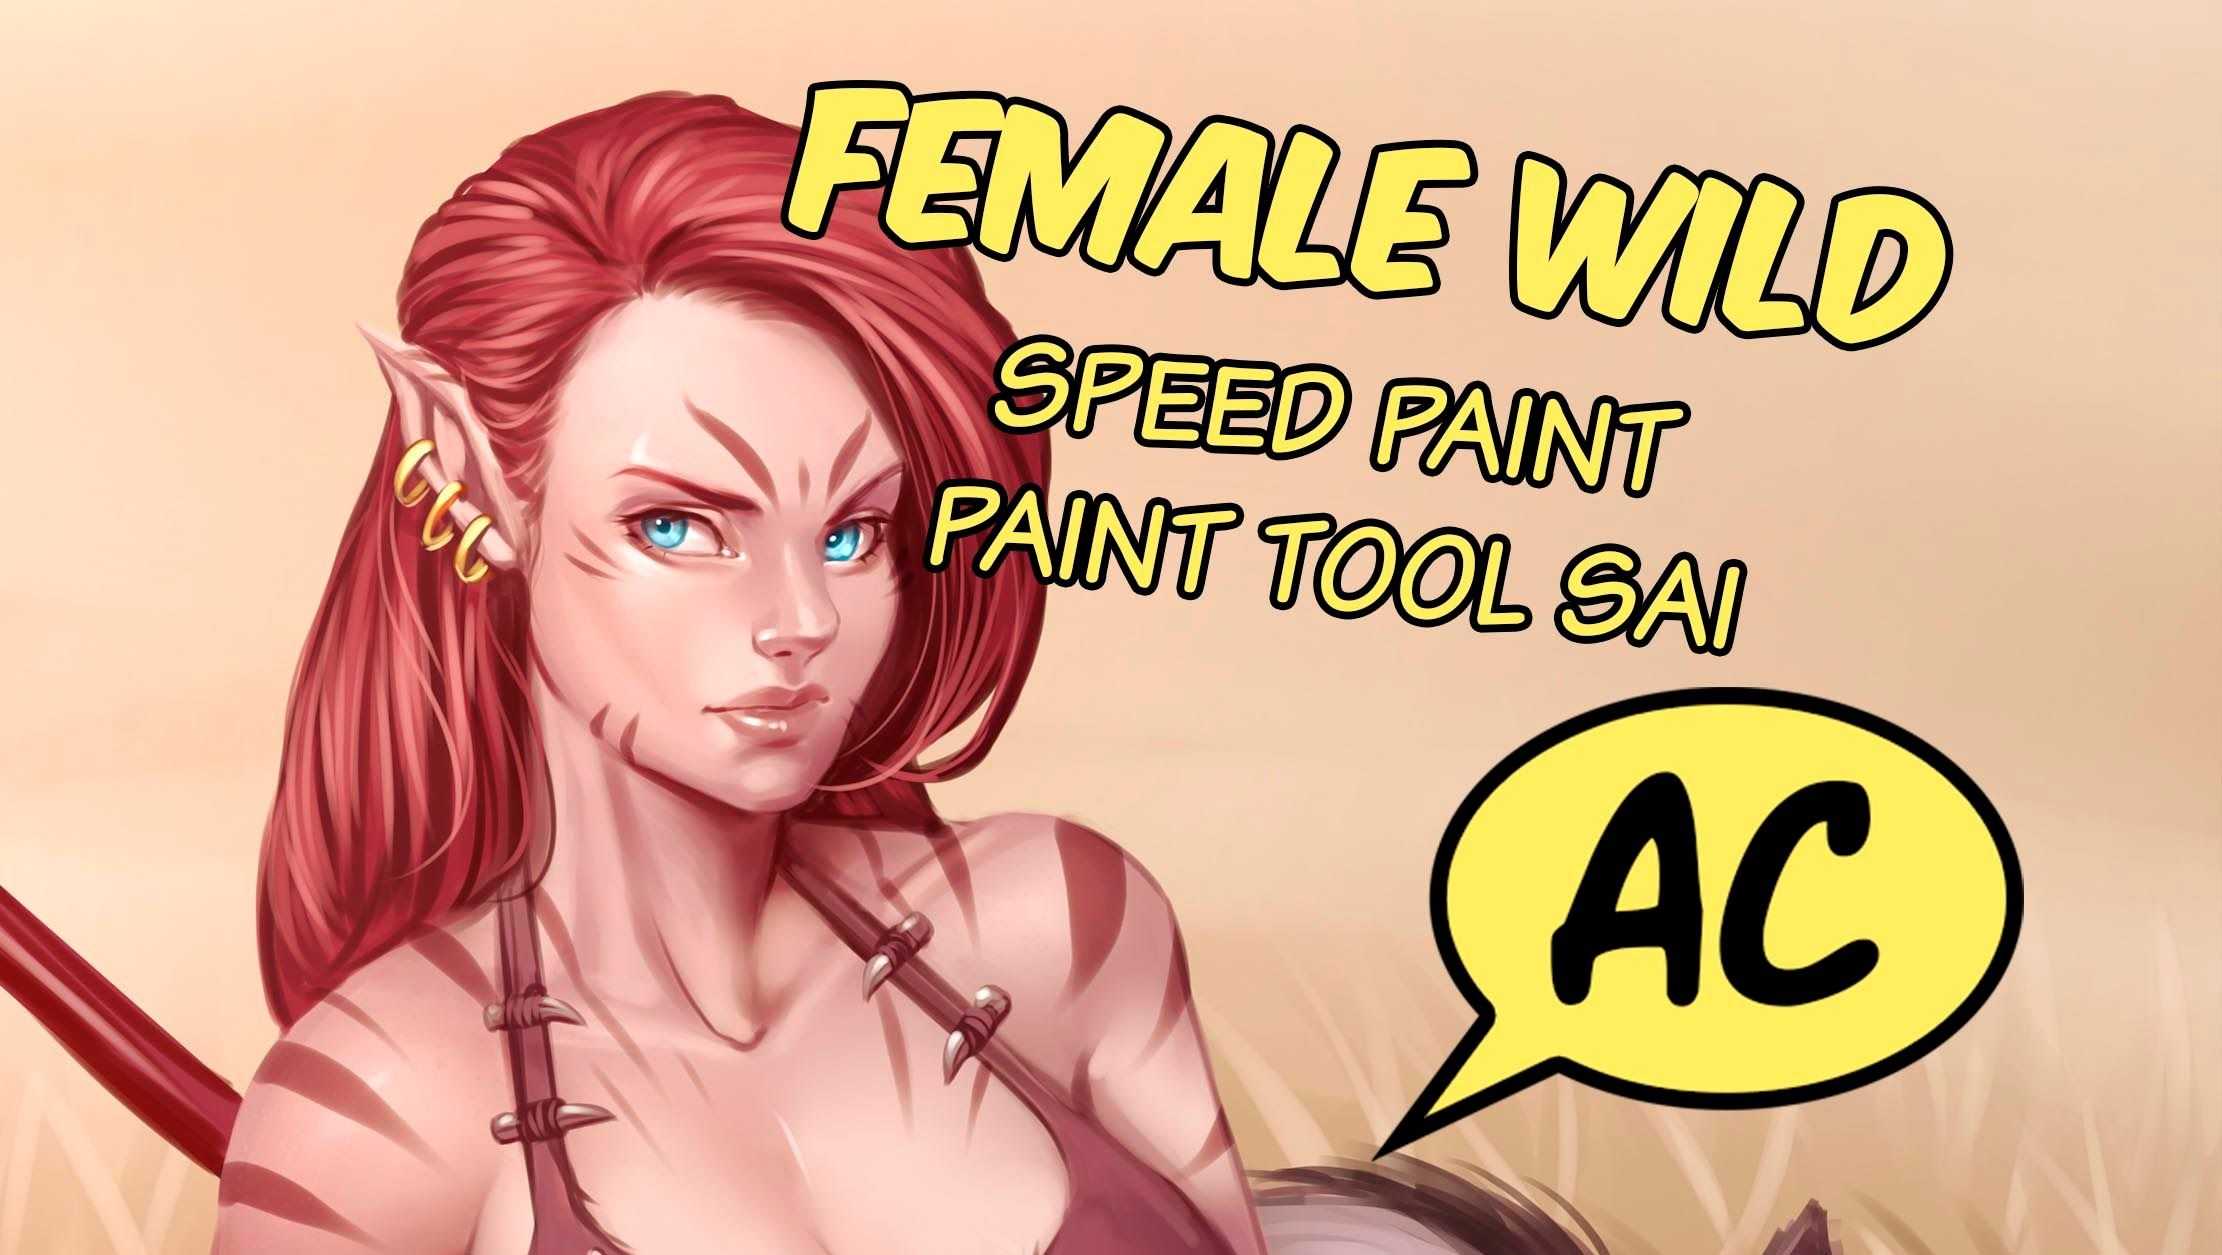 Female Wild _ Speed paint _ Paint tool Sai